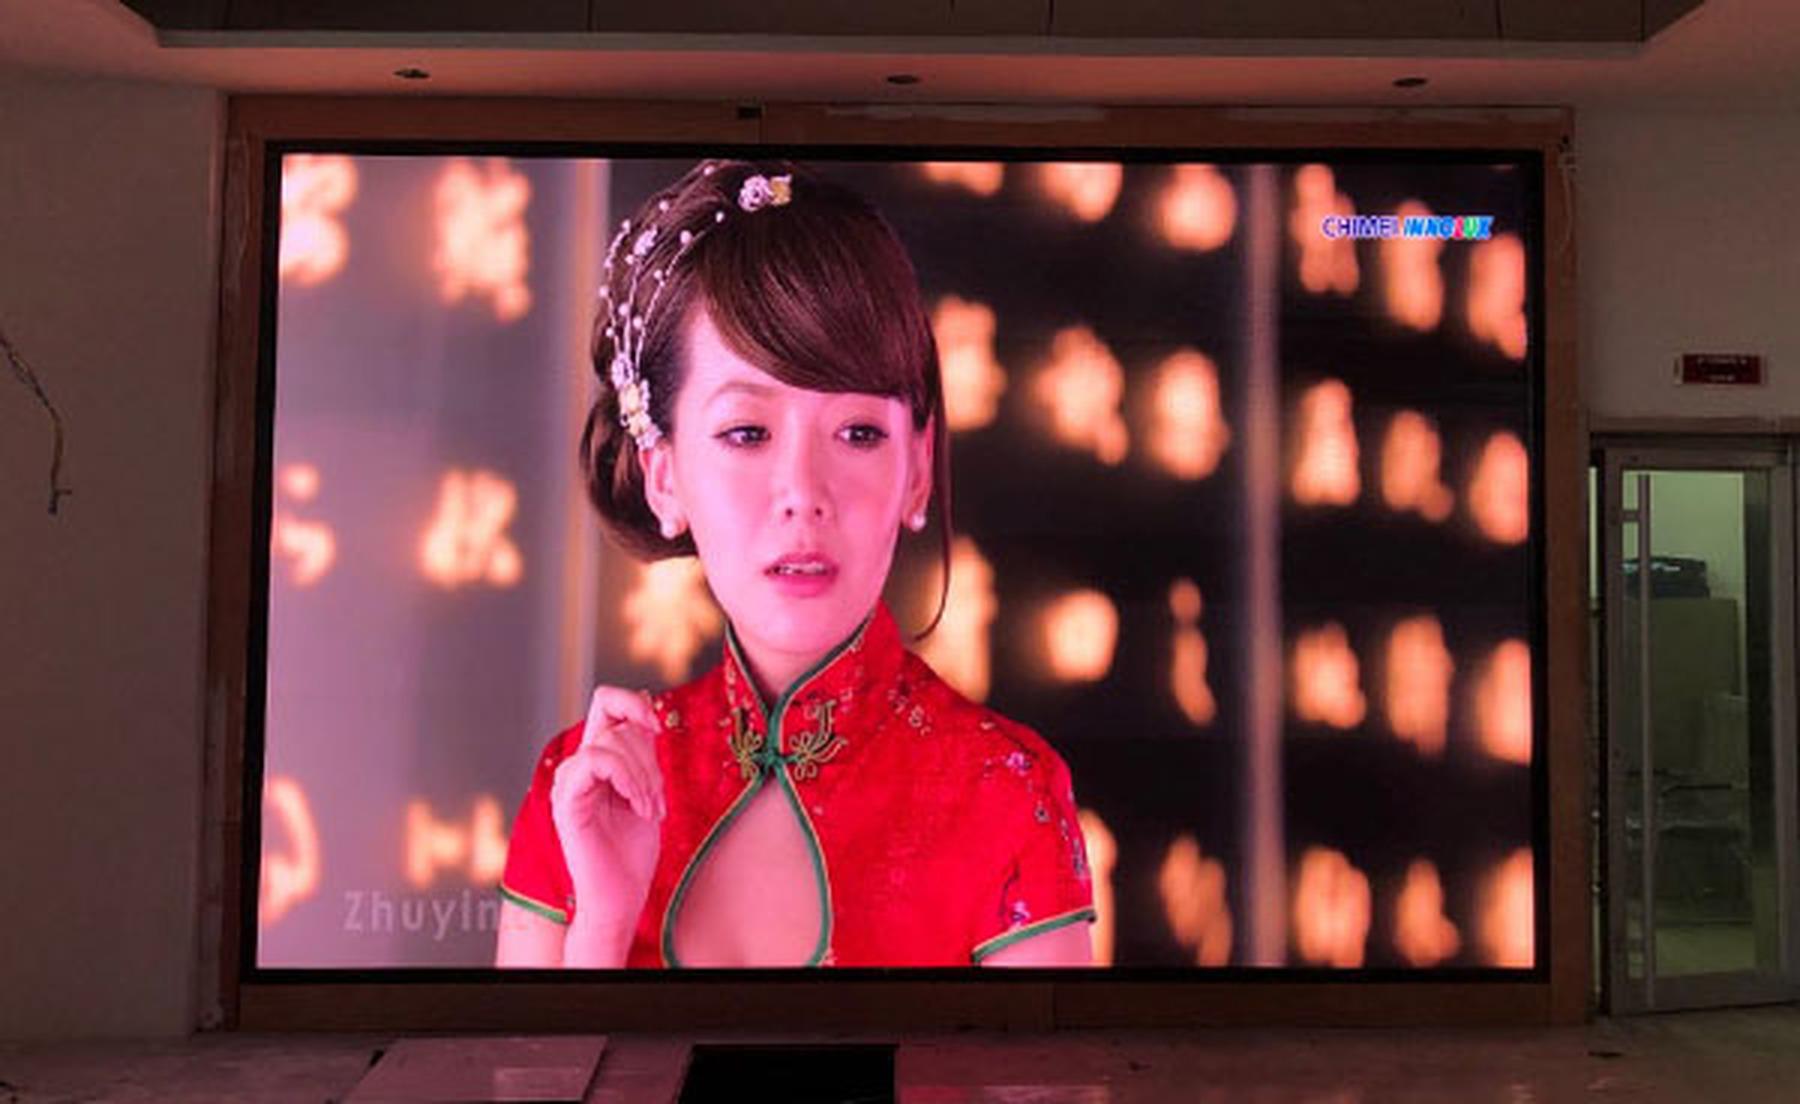 高清会议室LED显示屏